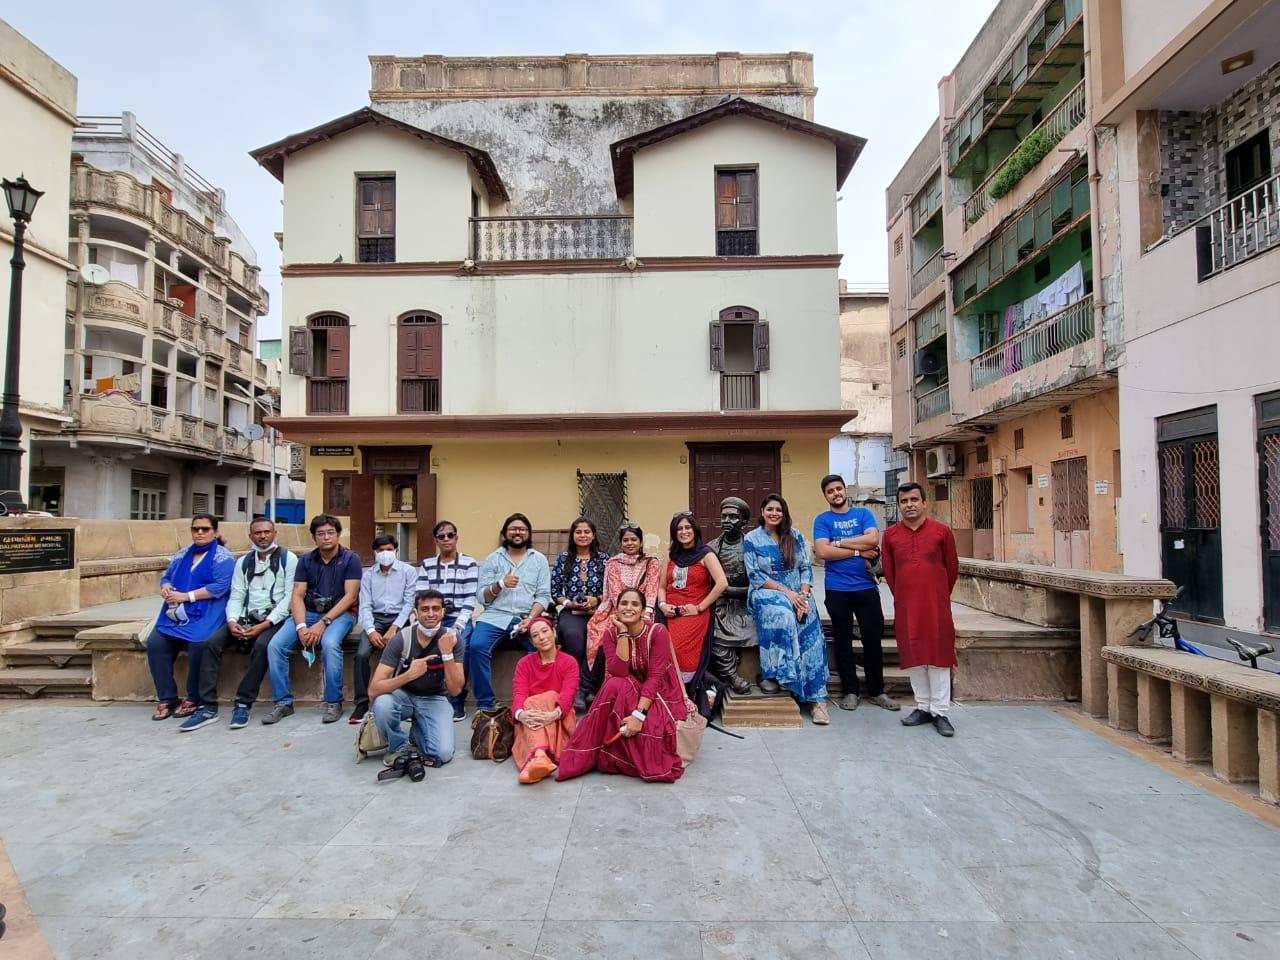 Incredible Ahmedabad Heritage Walk - Explore Ahmedabad